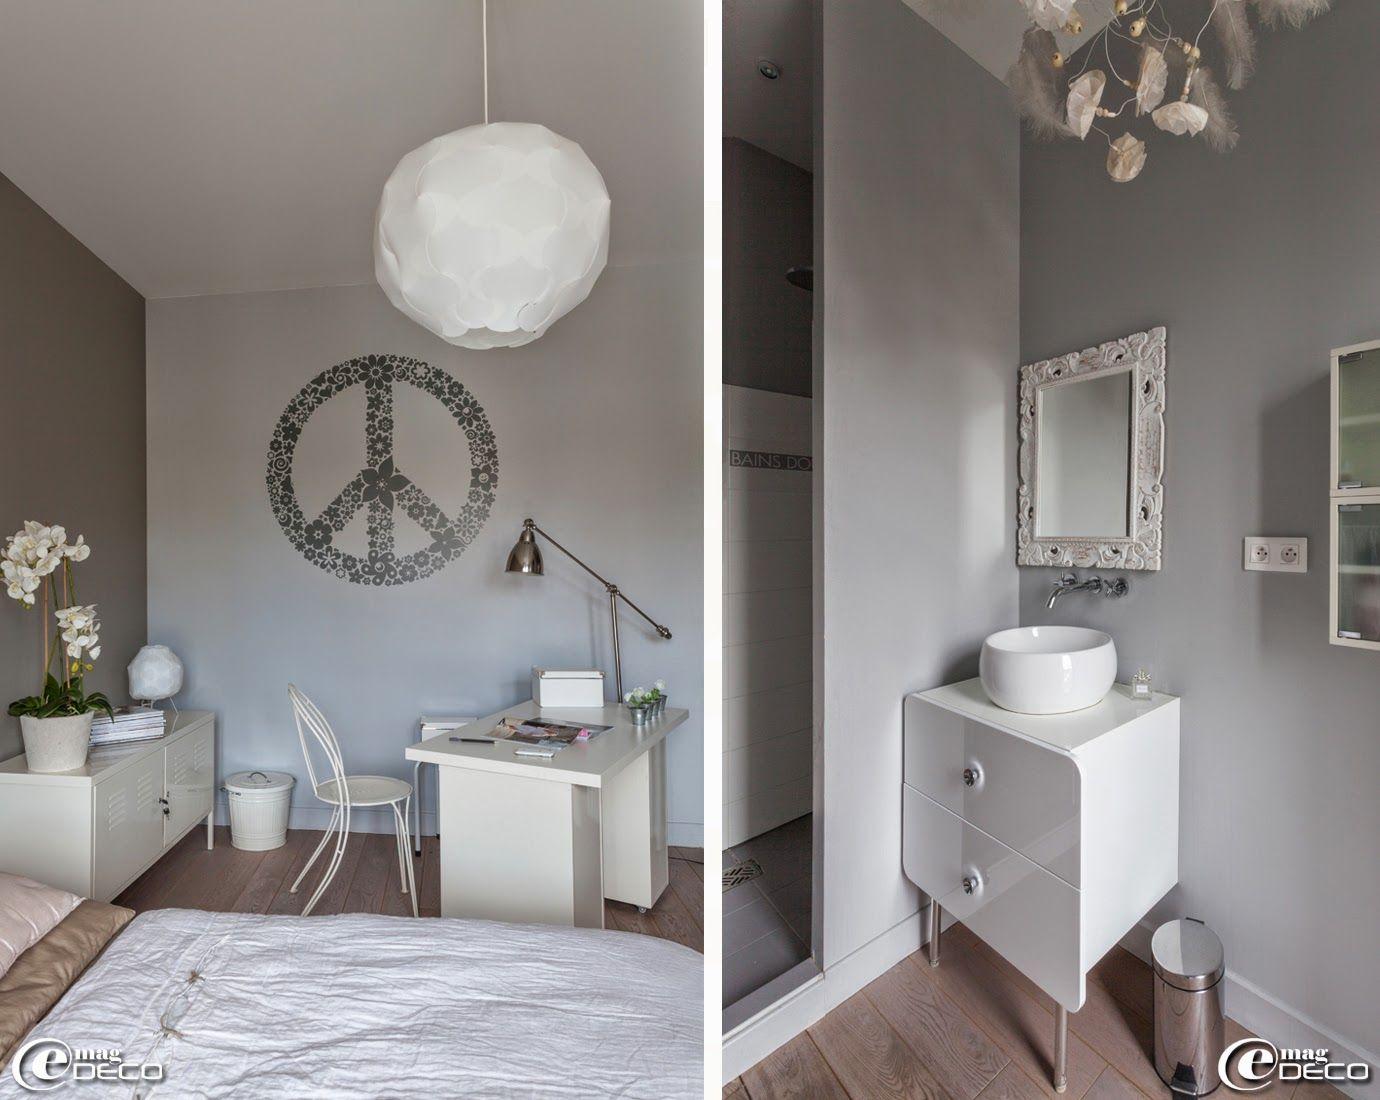 ikea meuble cache bidet trendy armoire lavabo salle bain ikea with evier salle de bain ikea. Black Bedroom Furniture Sets. Home Design Ideas